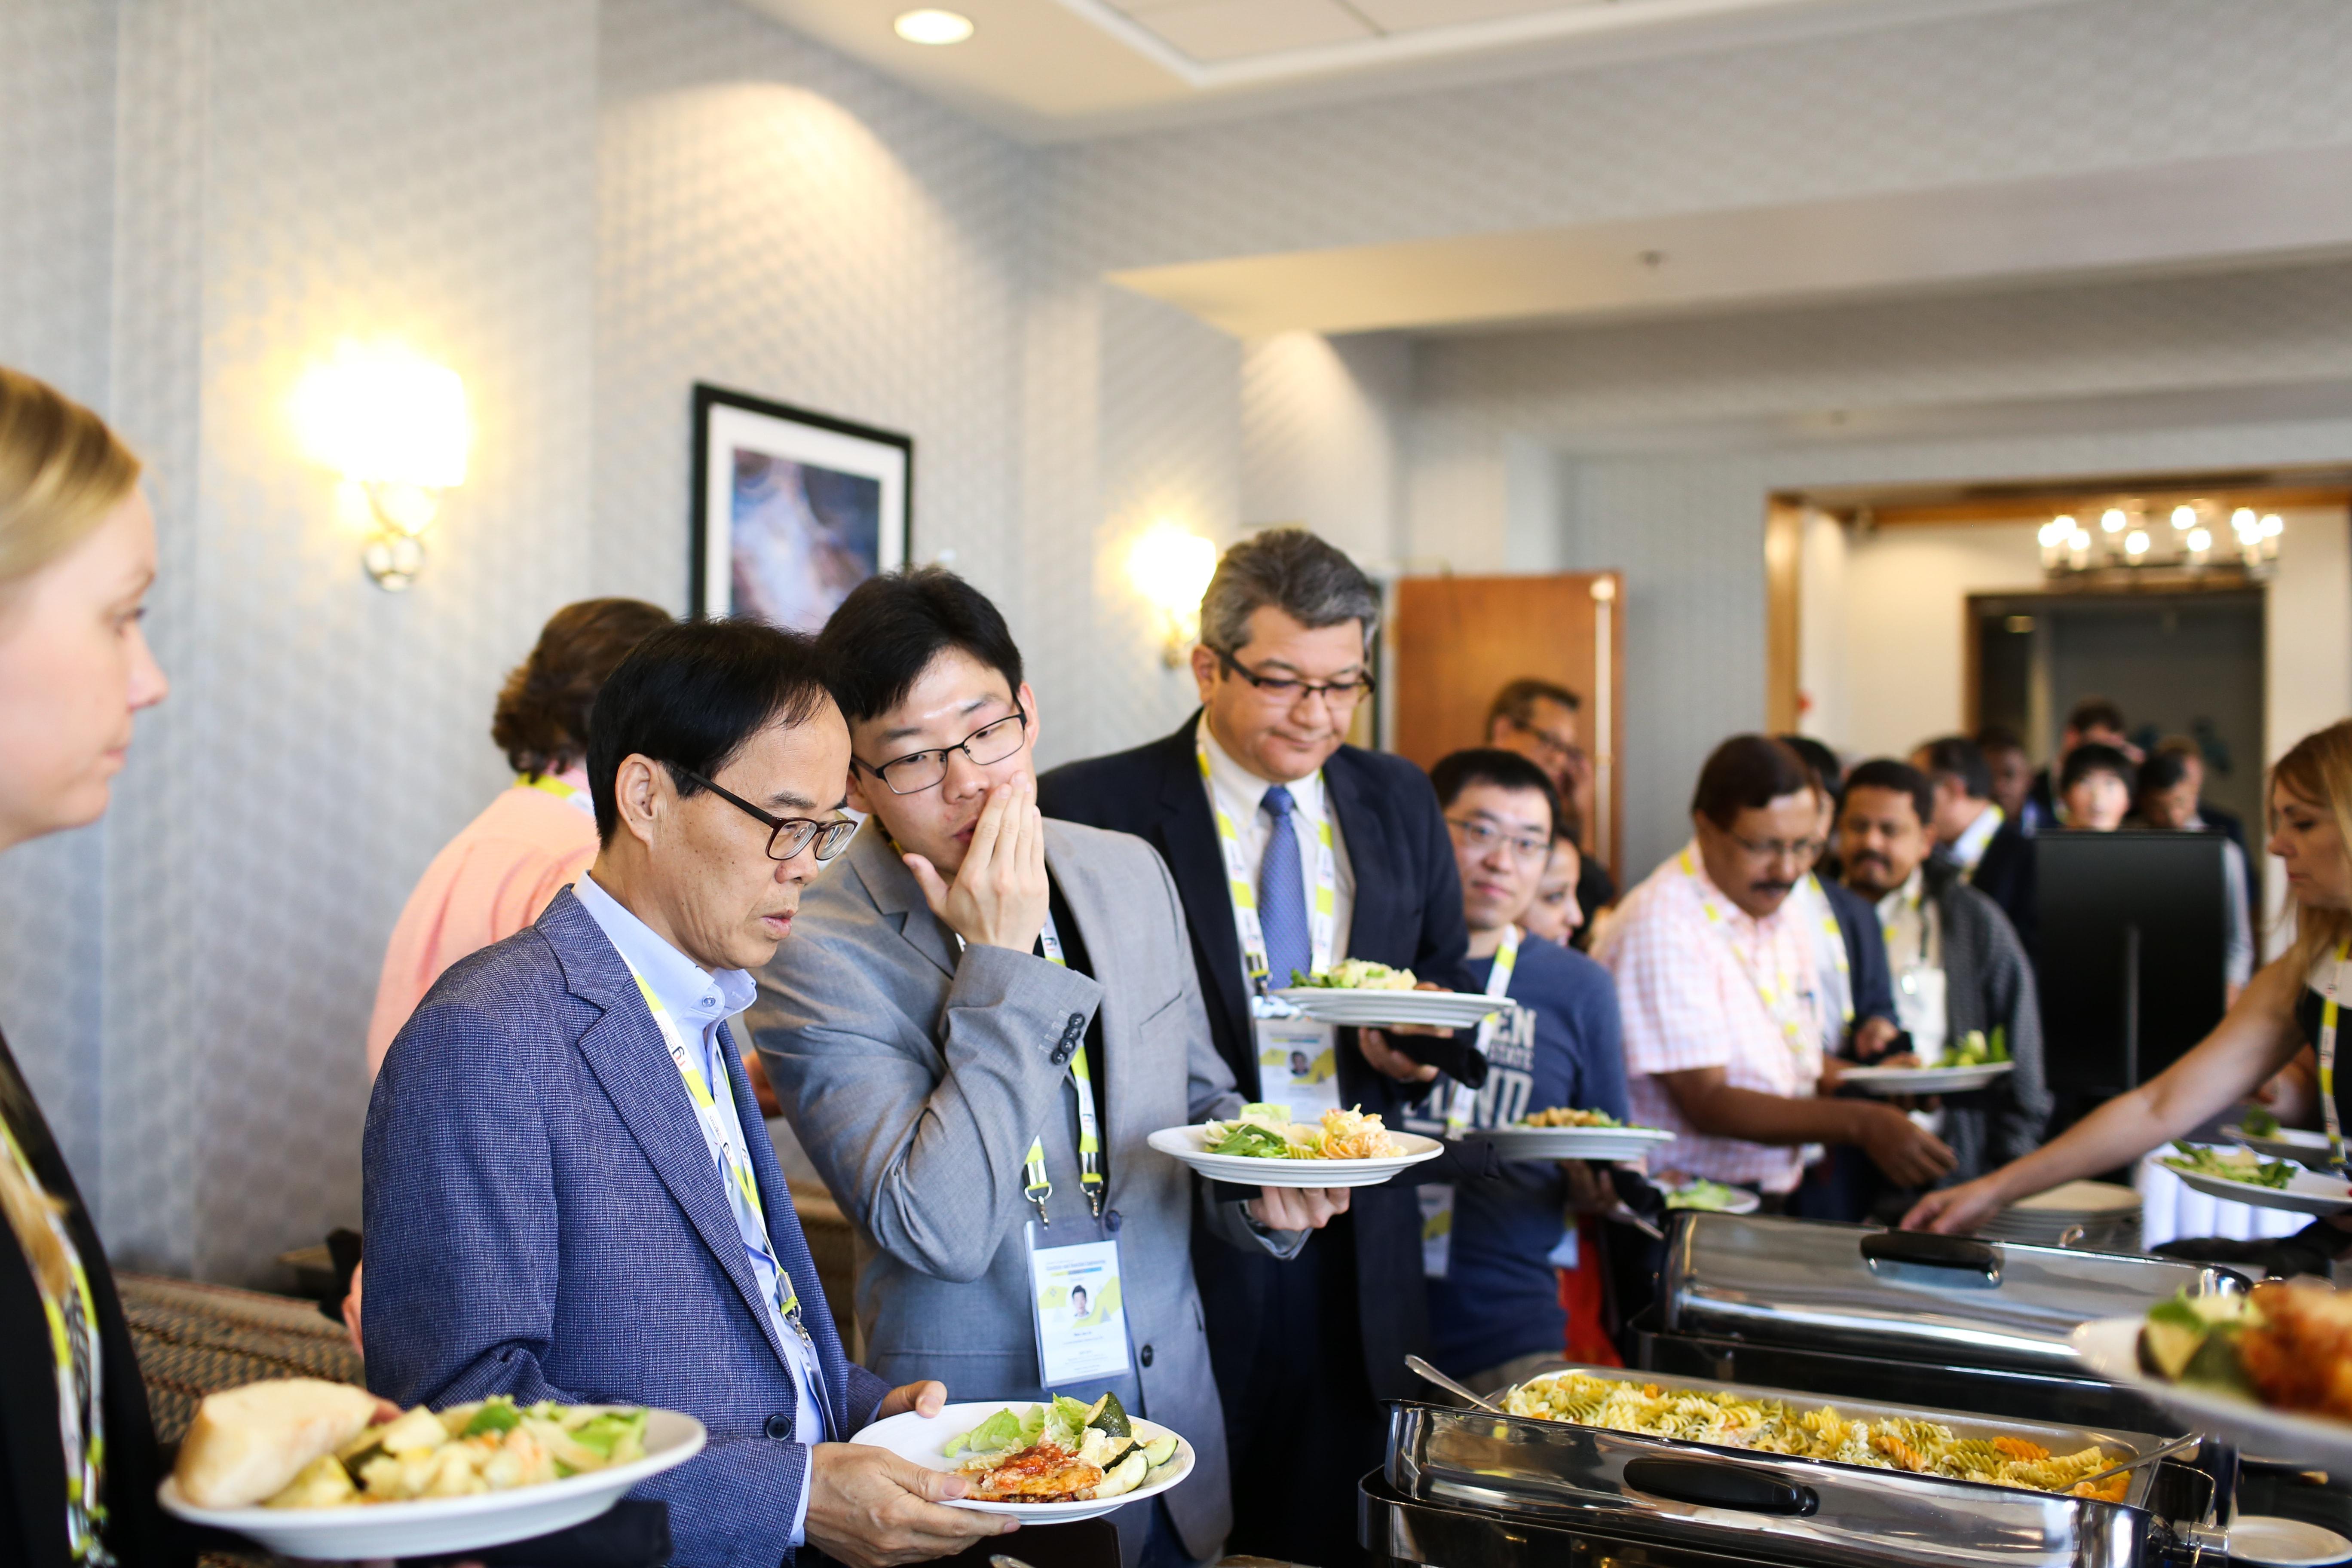 GCR 2017 speakers during lunch break